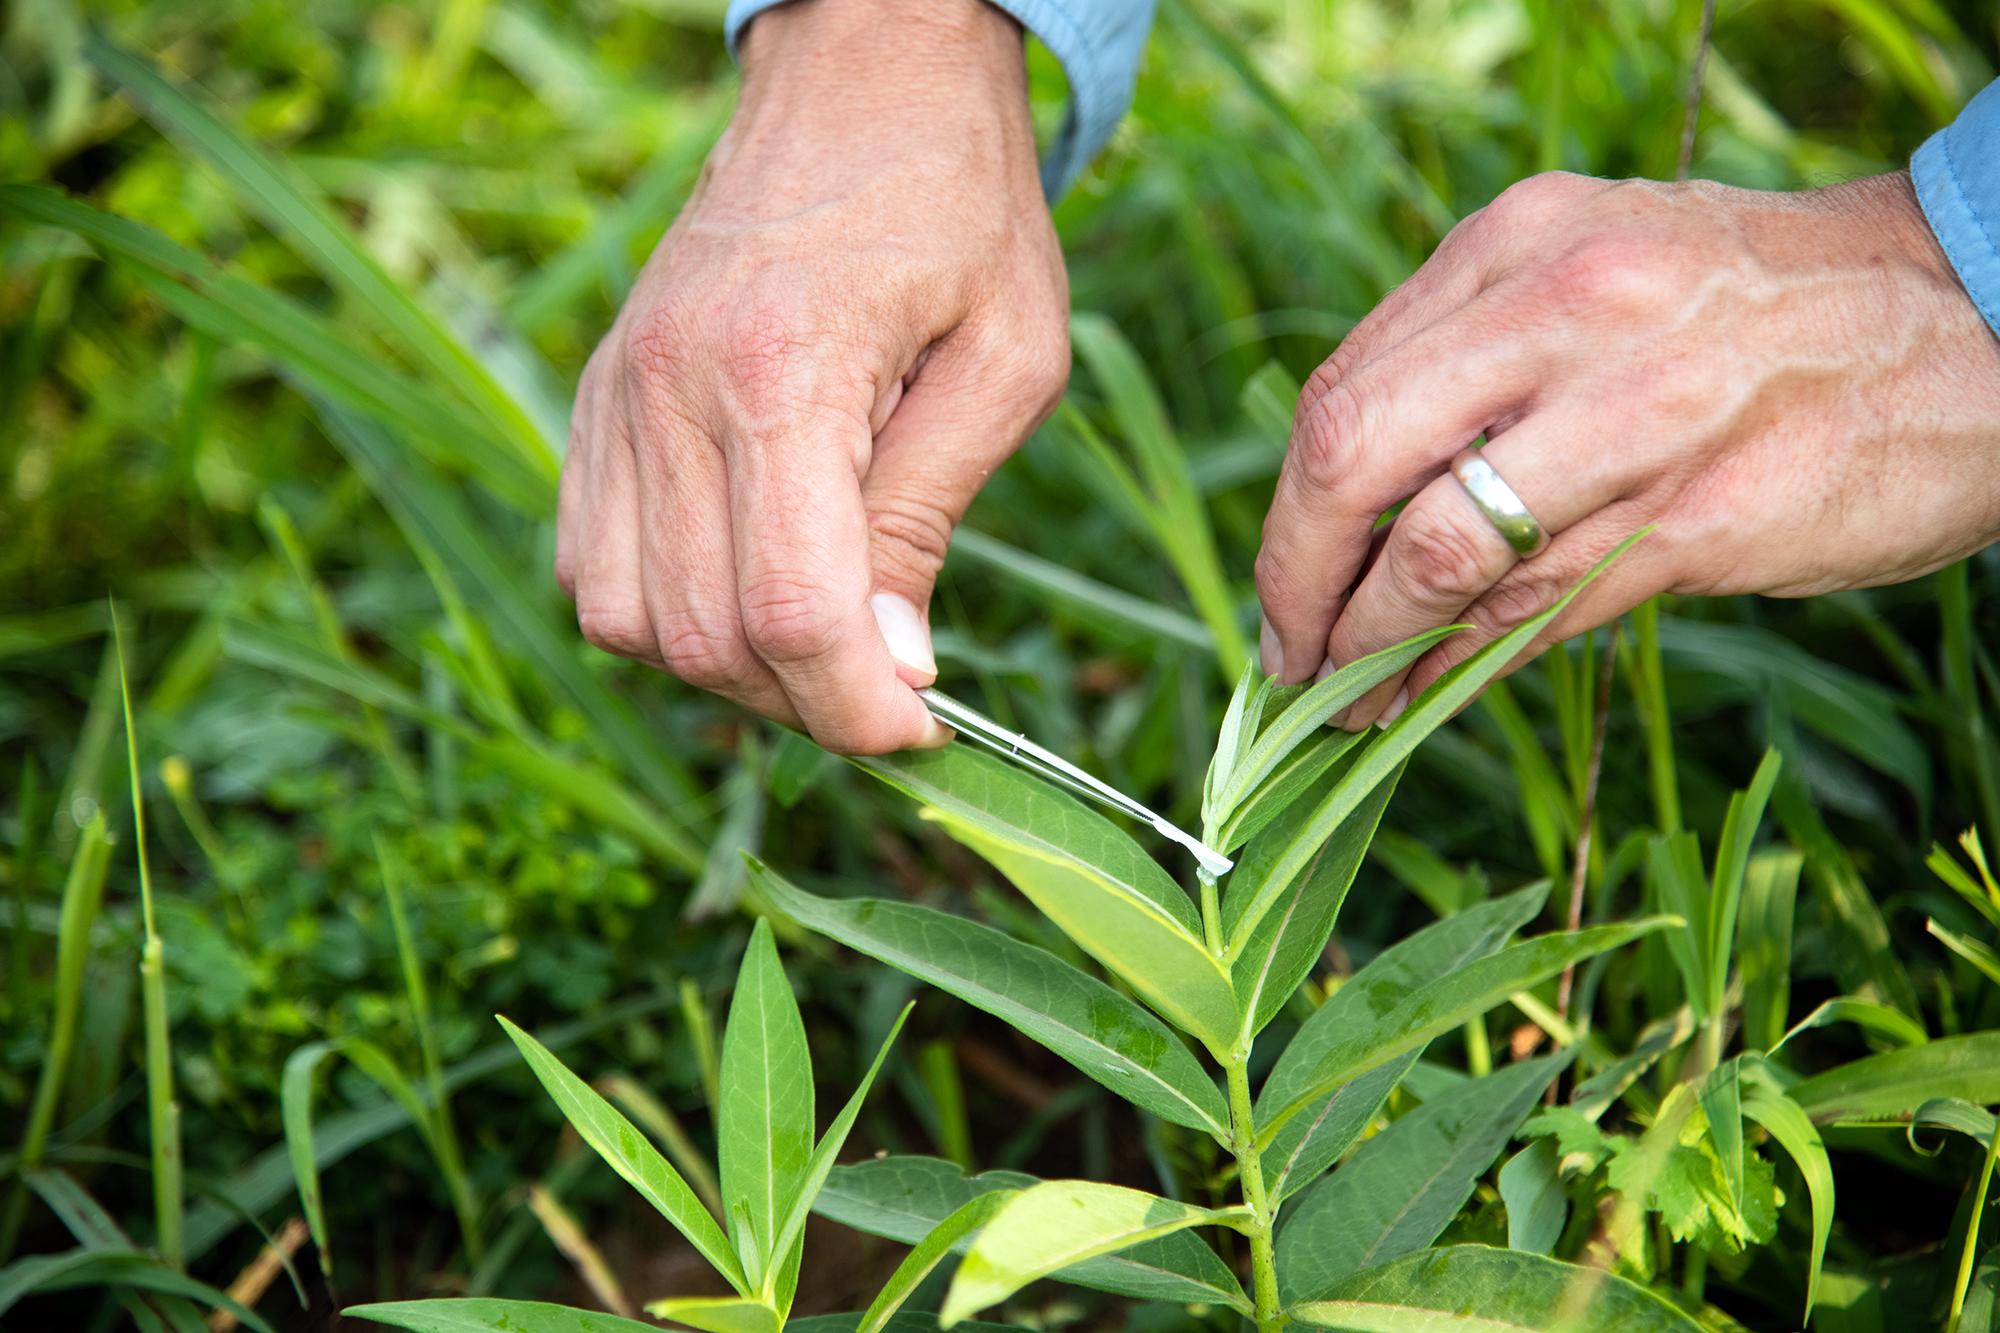 a man snips a segment of a milkweed plant